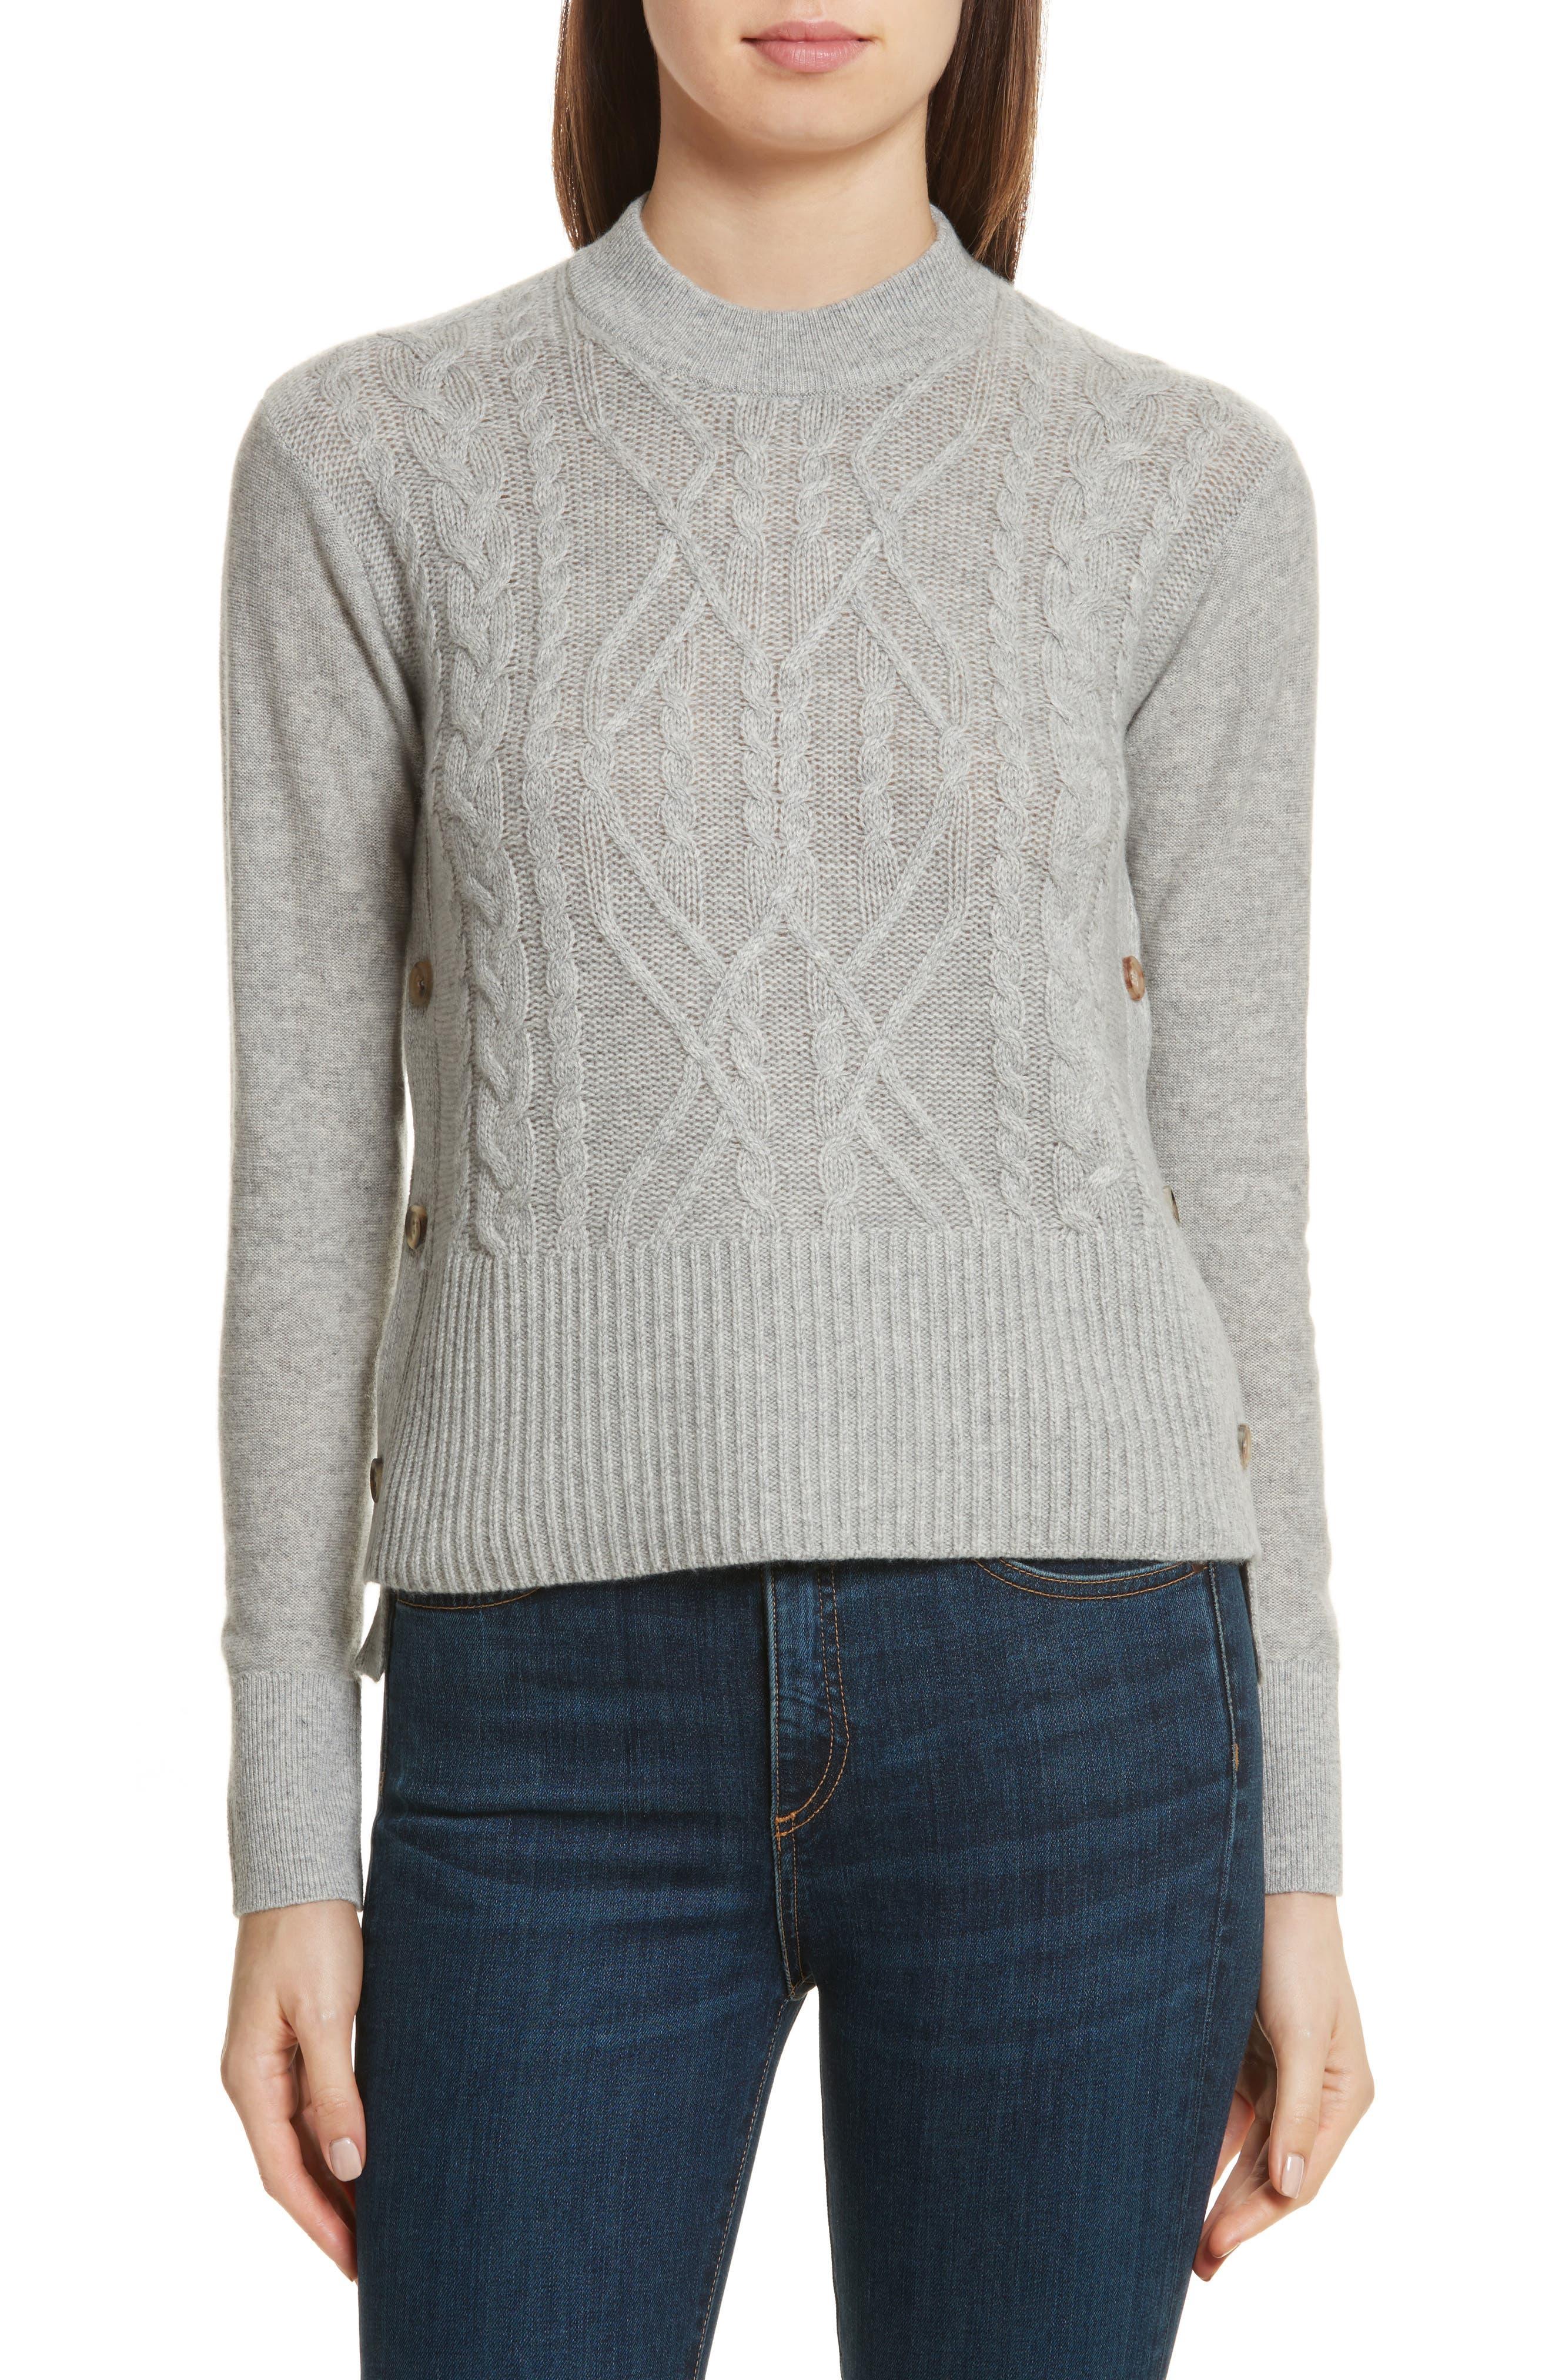 Main Image - Veronica Beard Kenna Cashmere Sweater